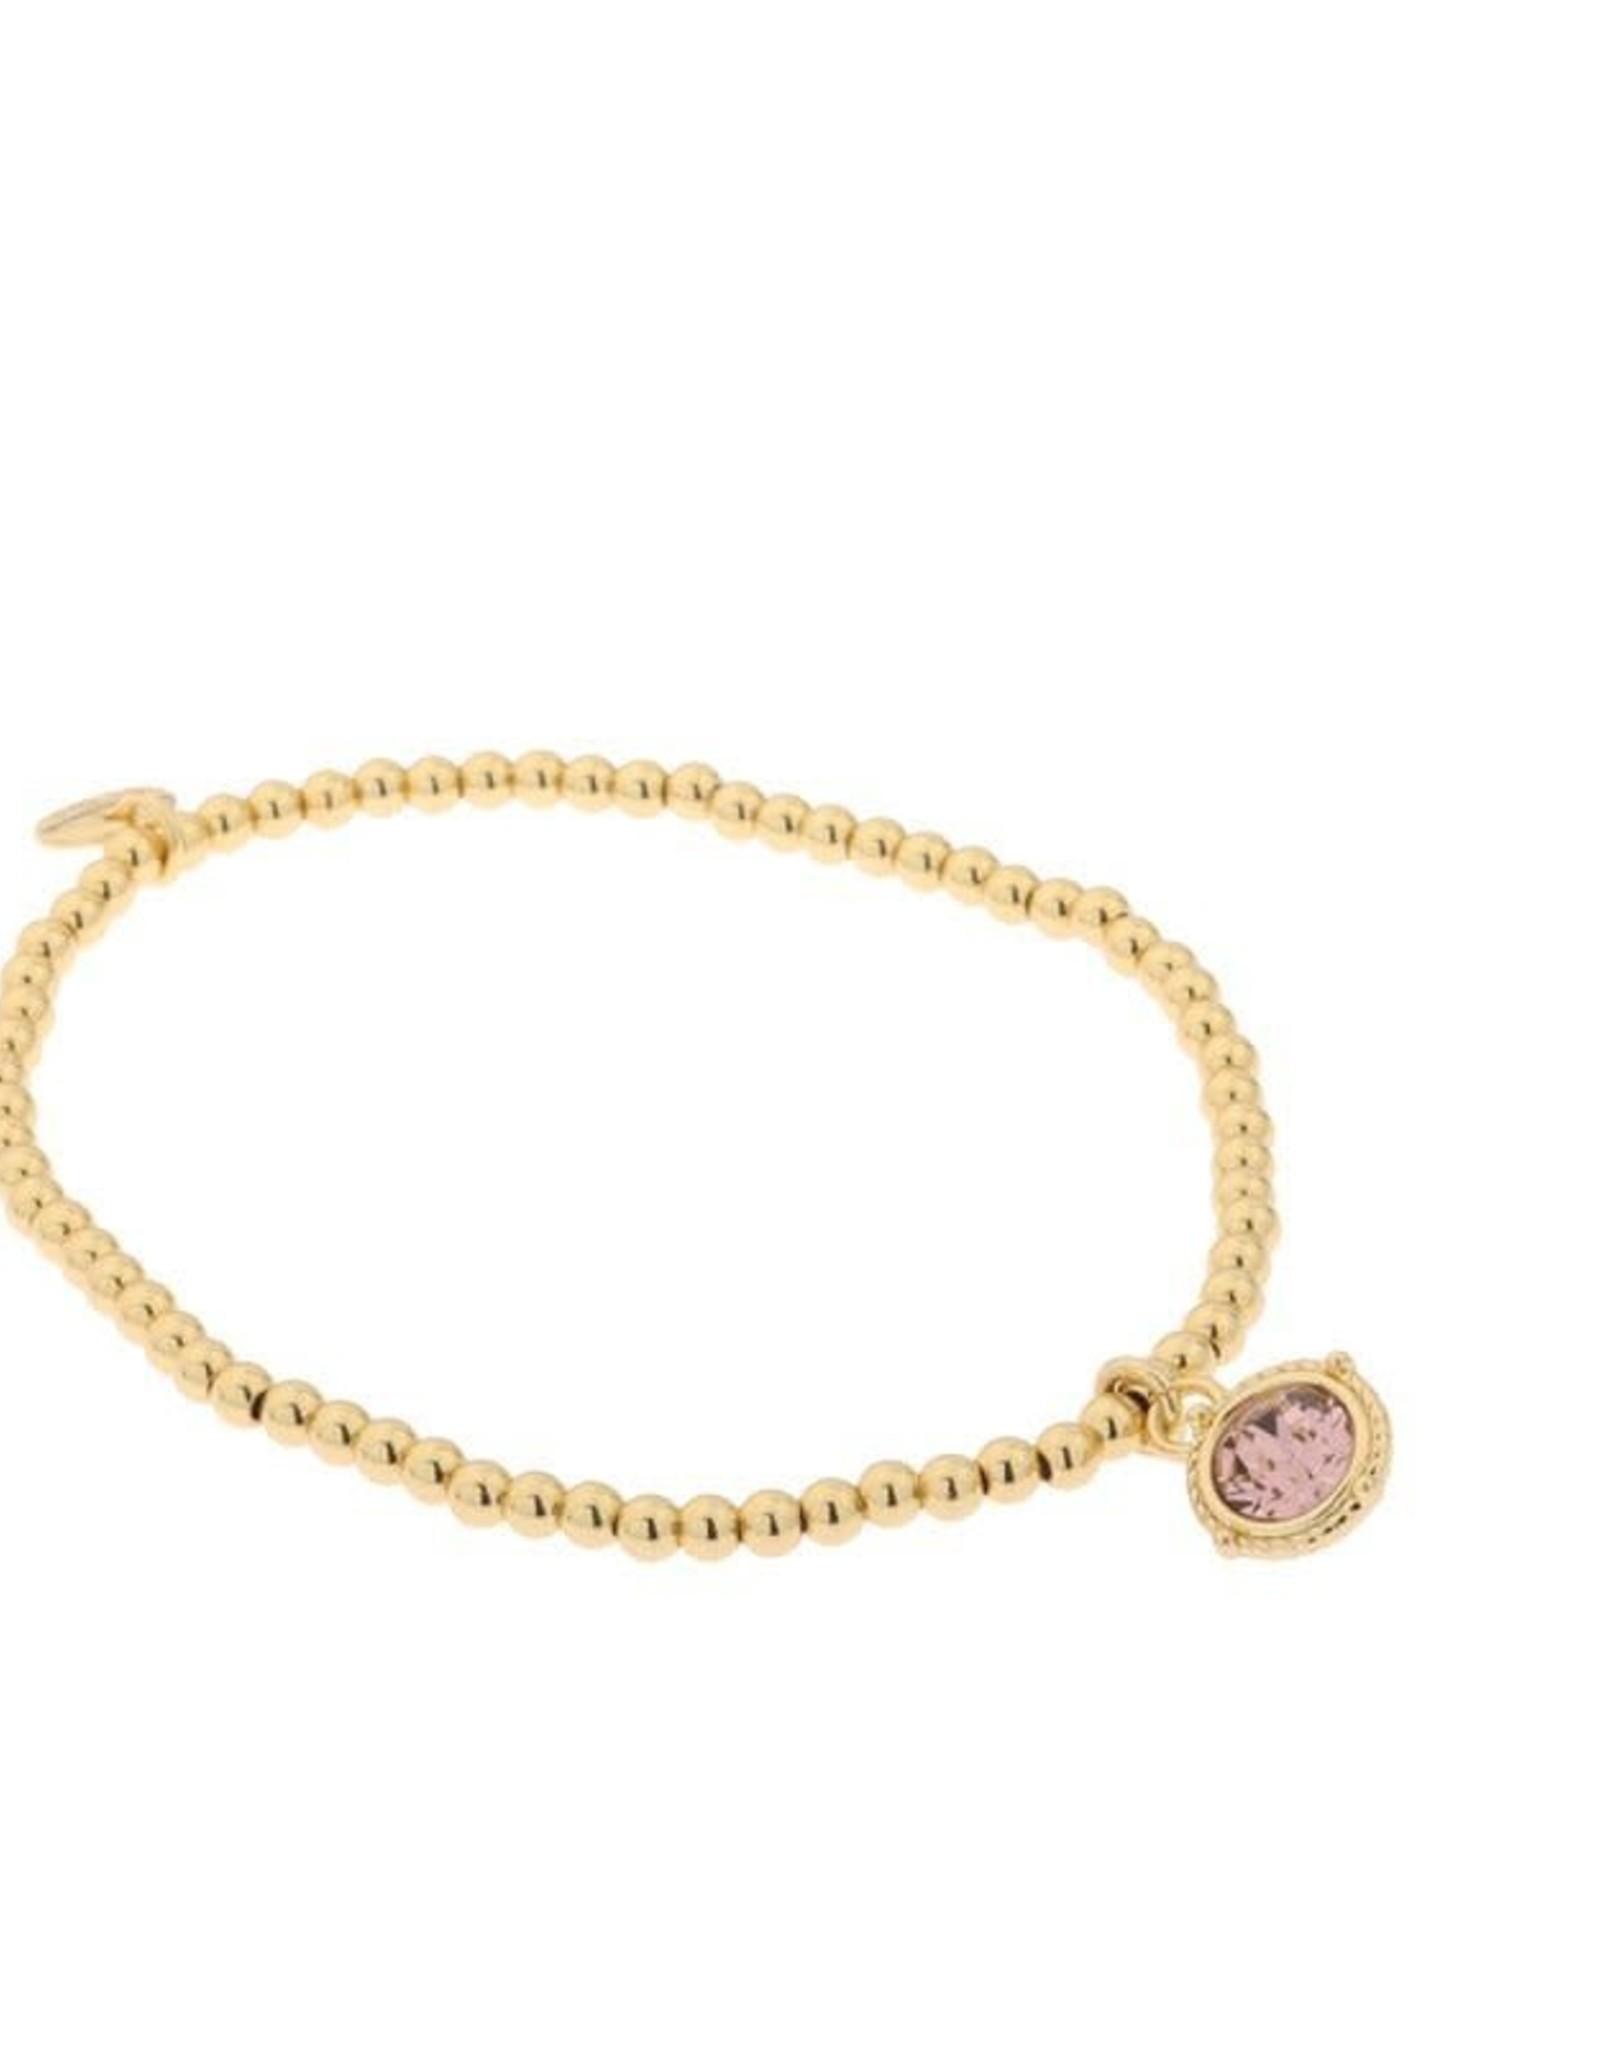 Biba Biba armband met swarovski steen vintage roze